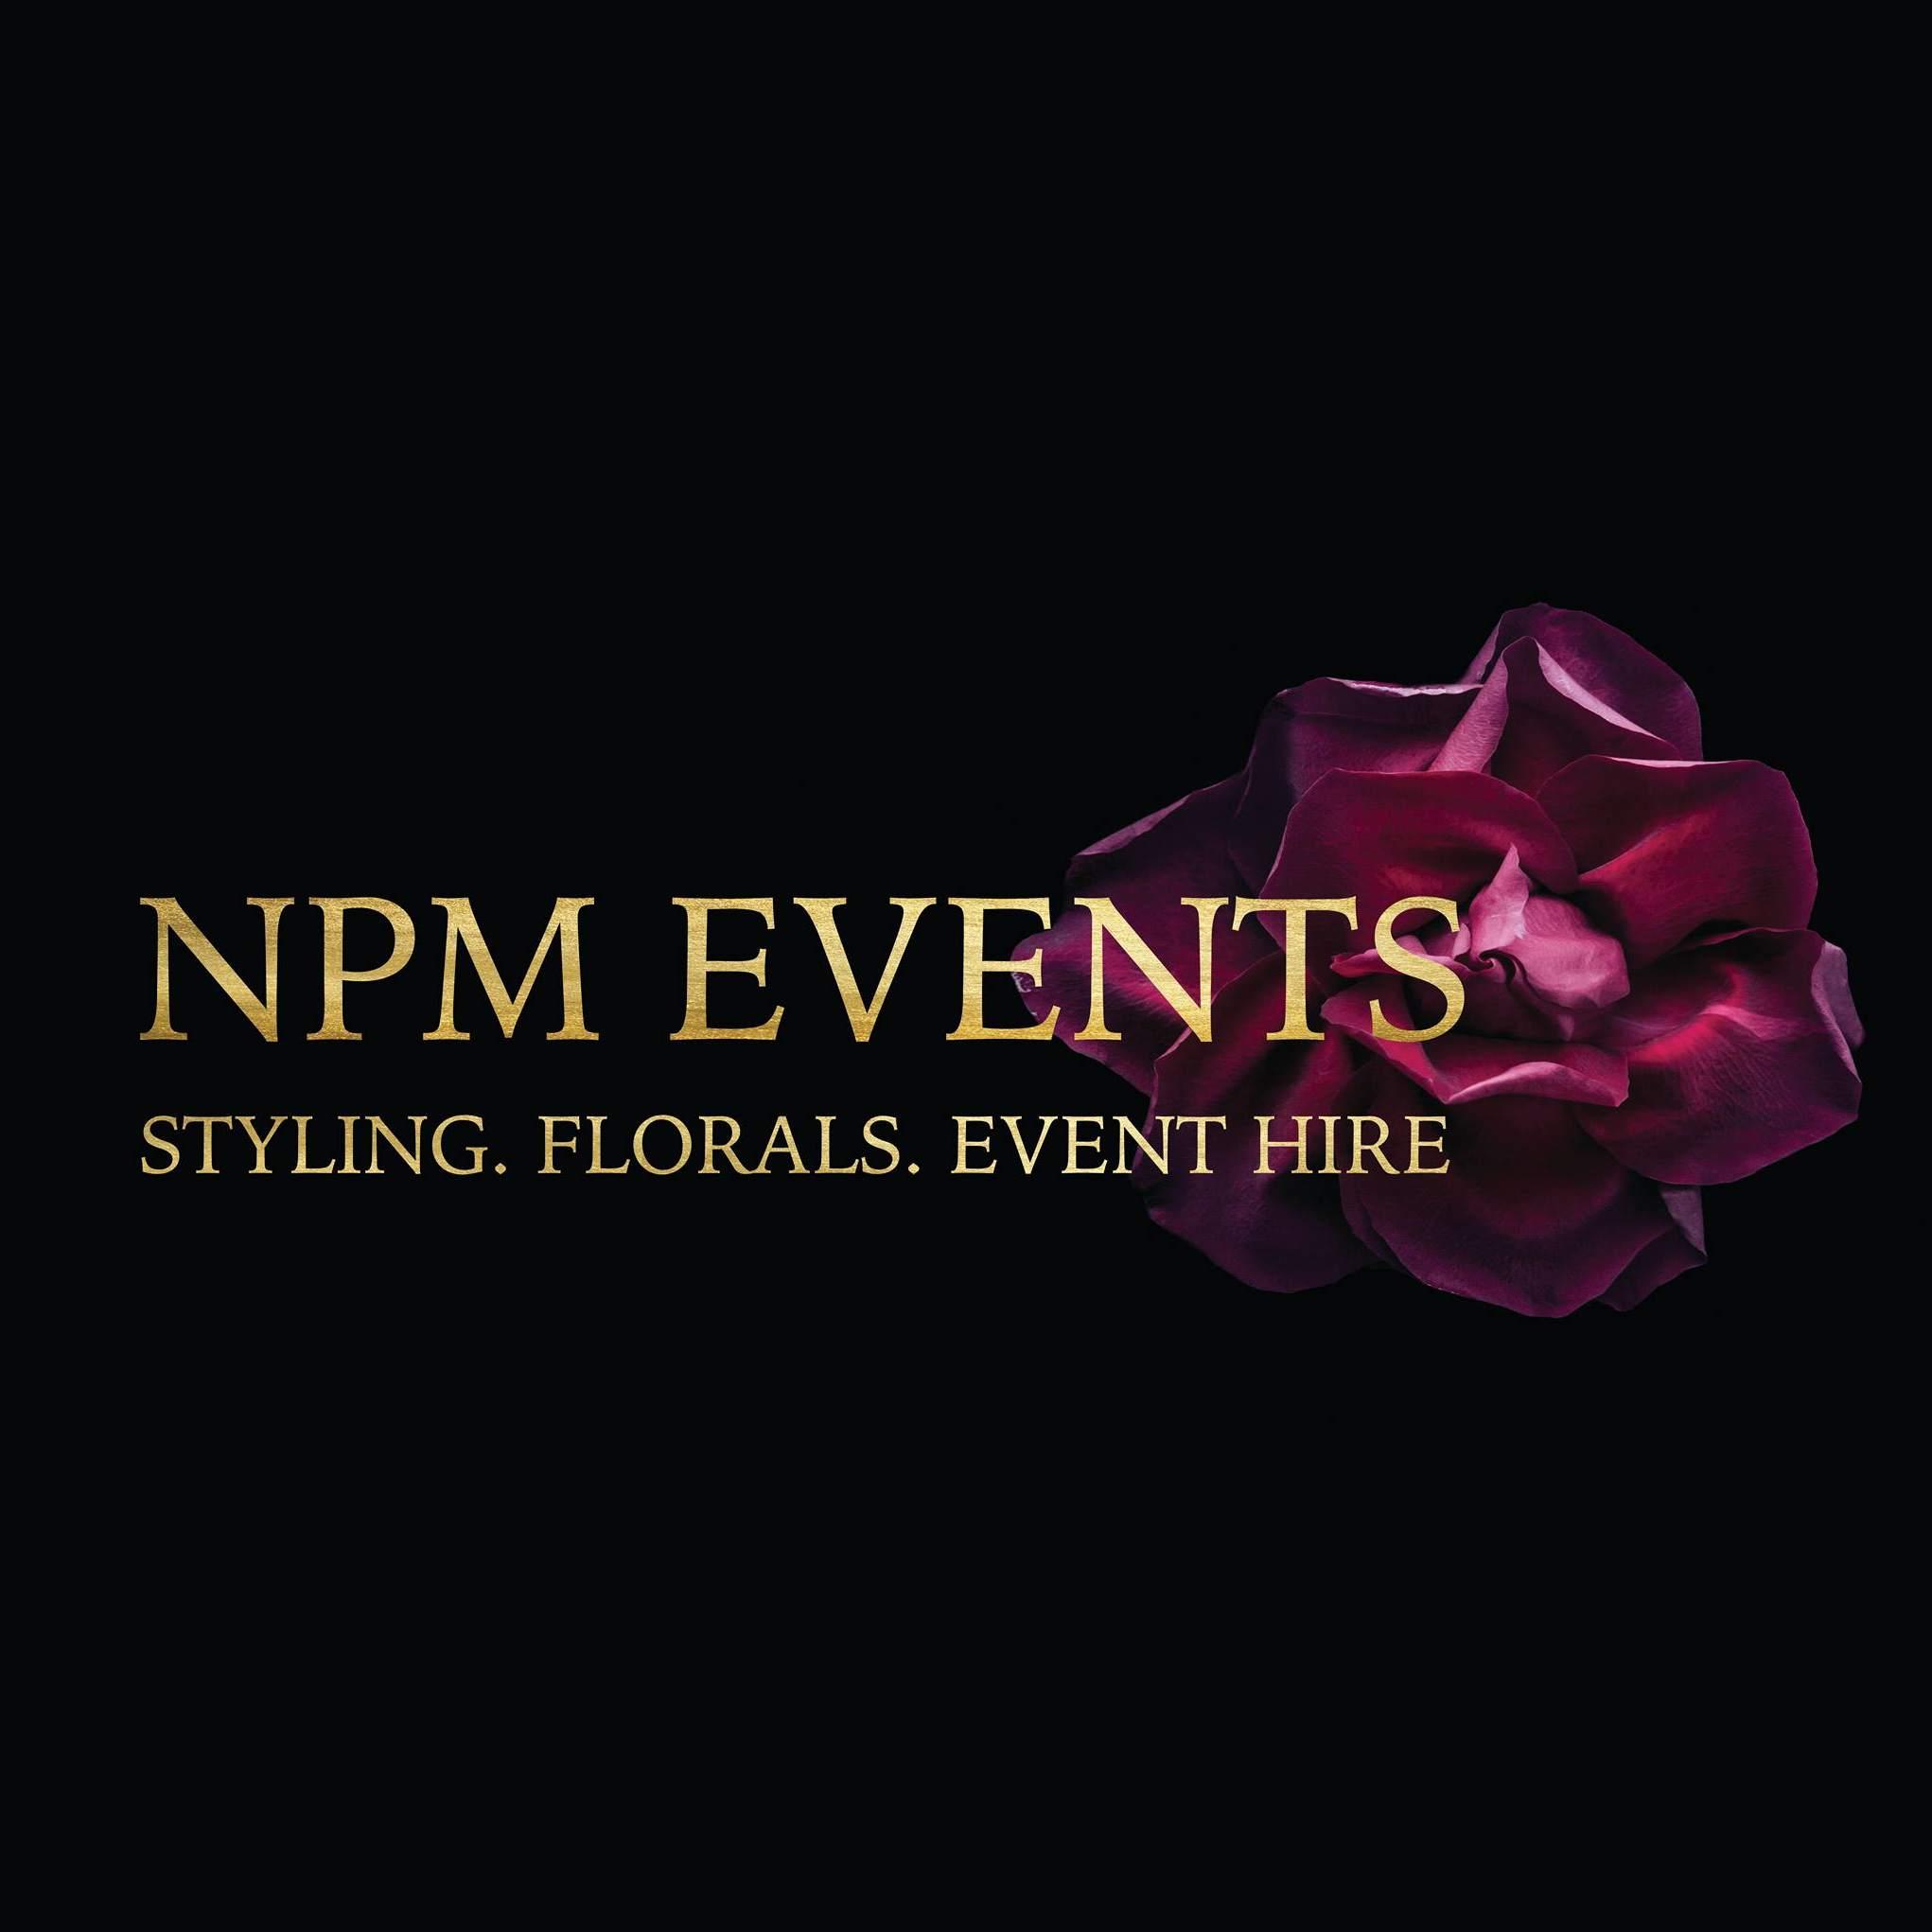 NPM Events